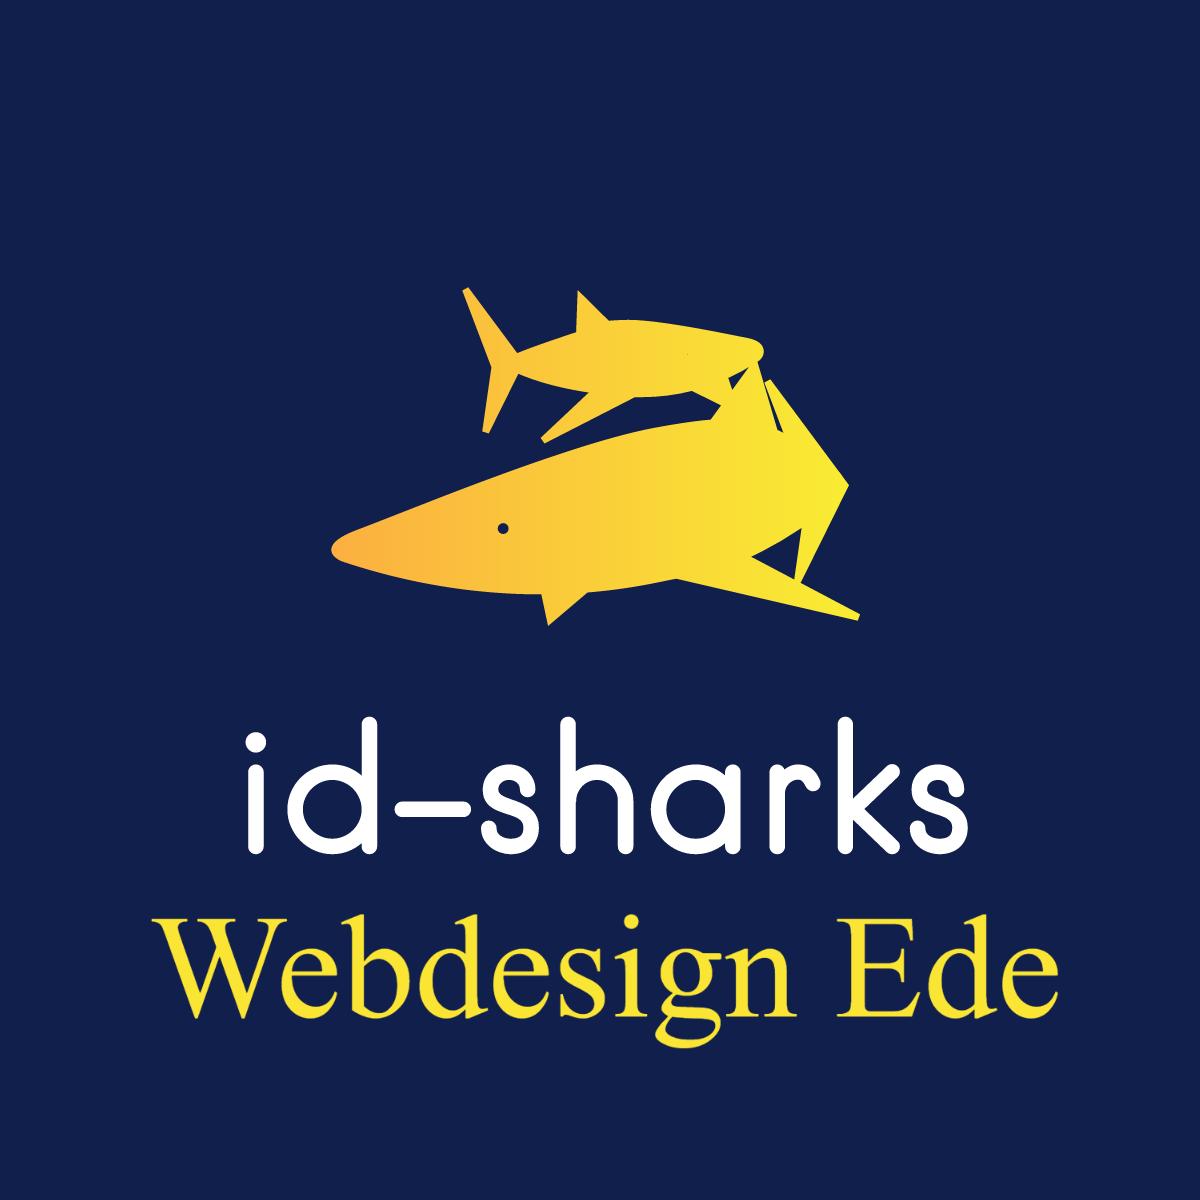 Webdesign Ede